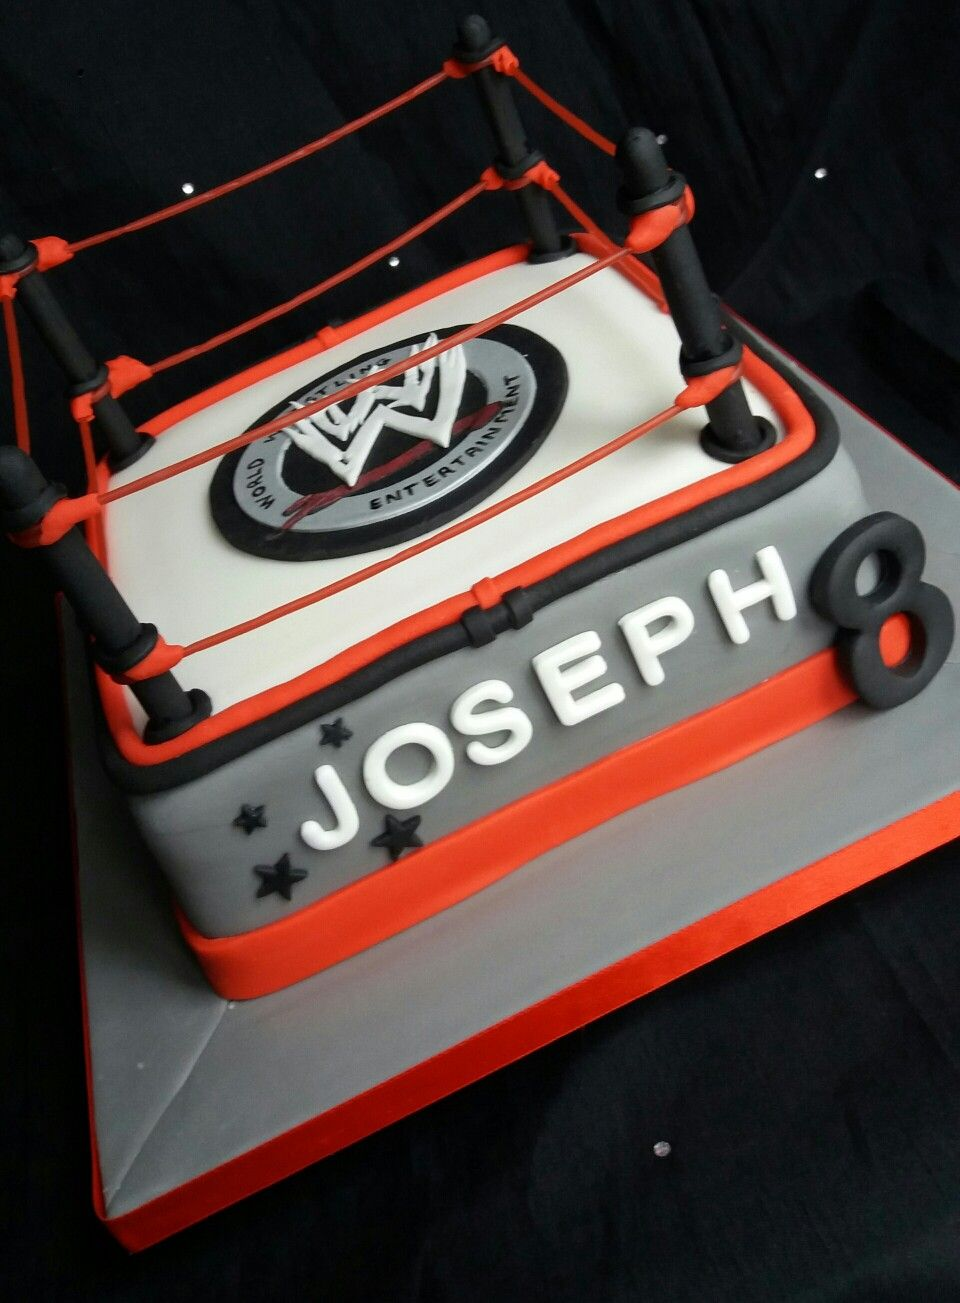 Ww wrestling ring cake wwe birthday cakes wrestling